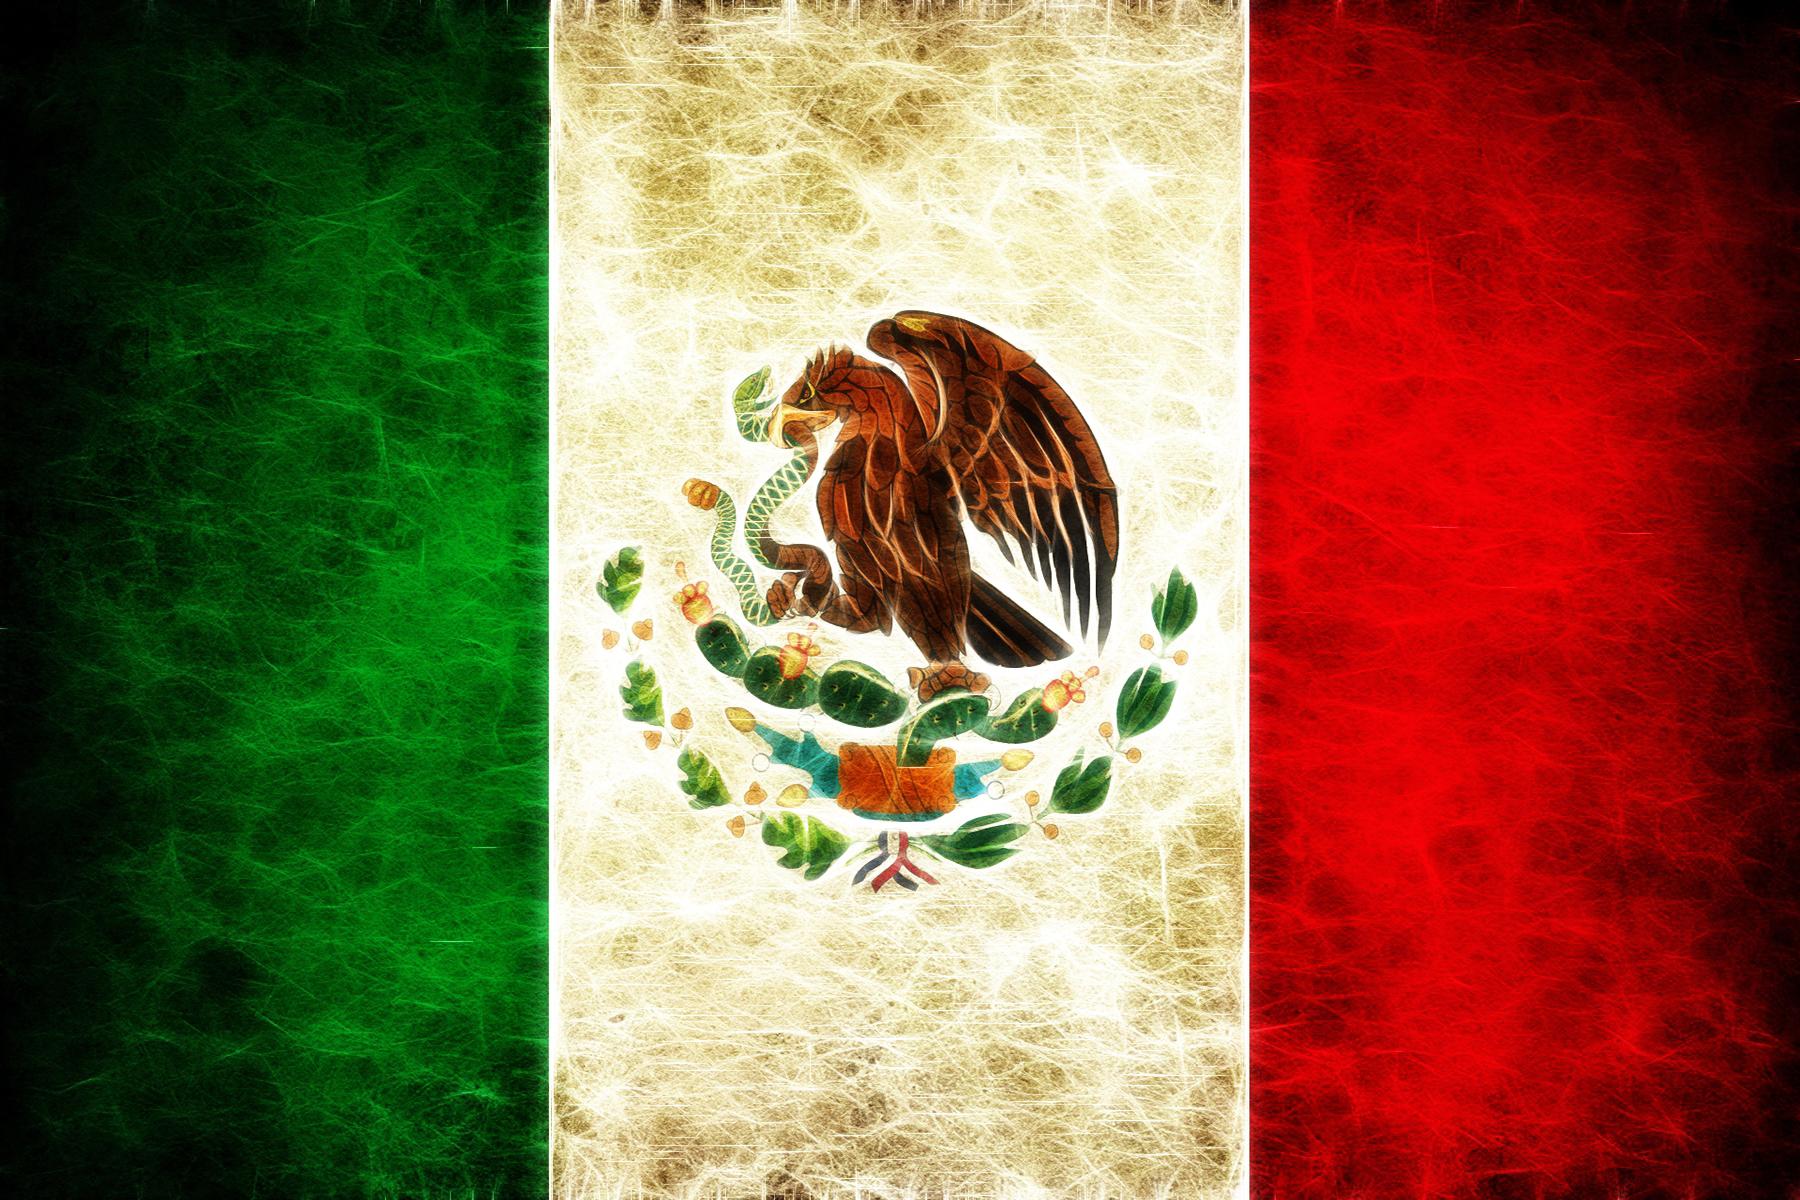 Mexico HD Wallpapers - WallpaperSafari